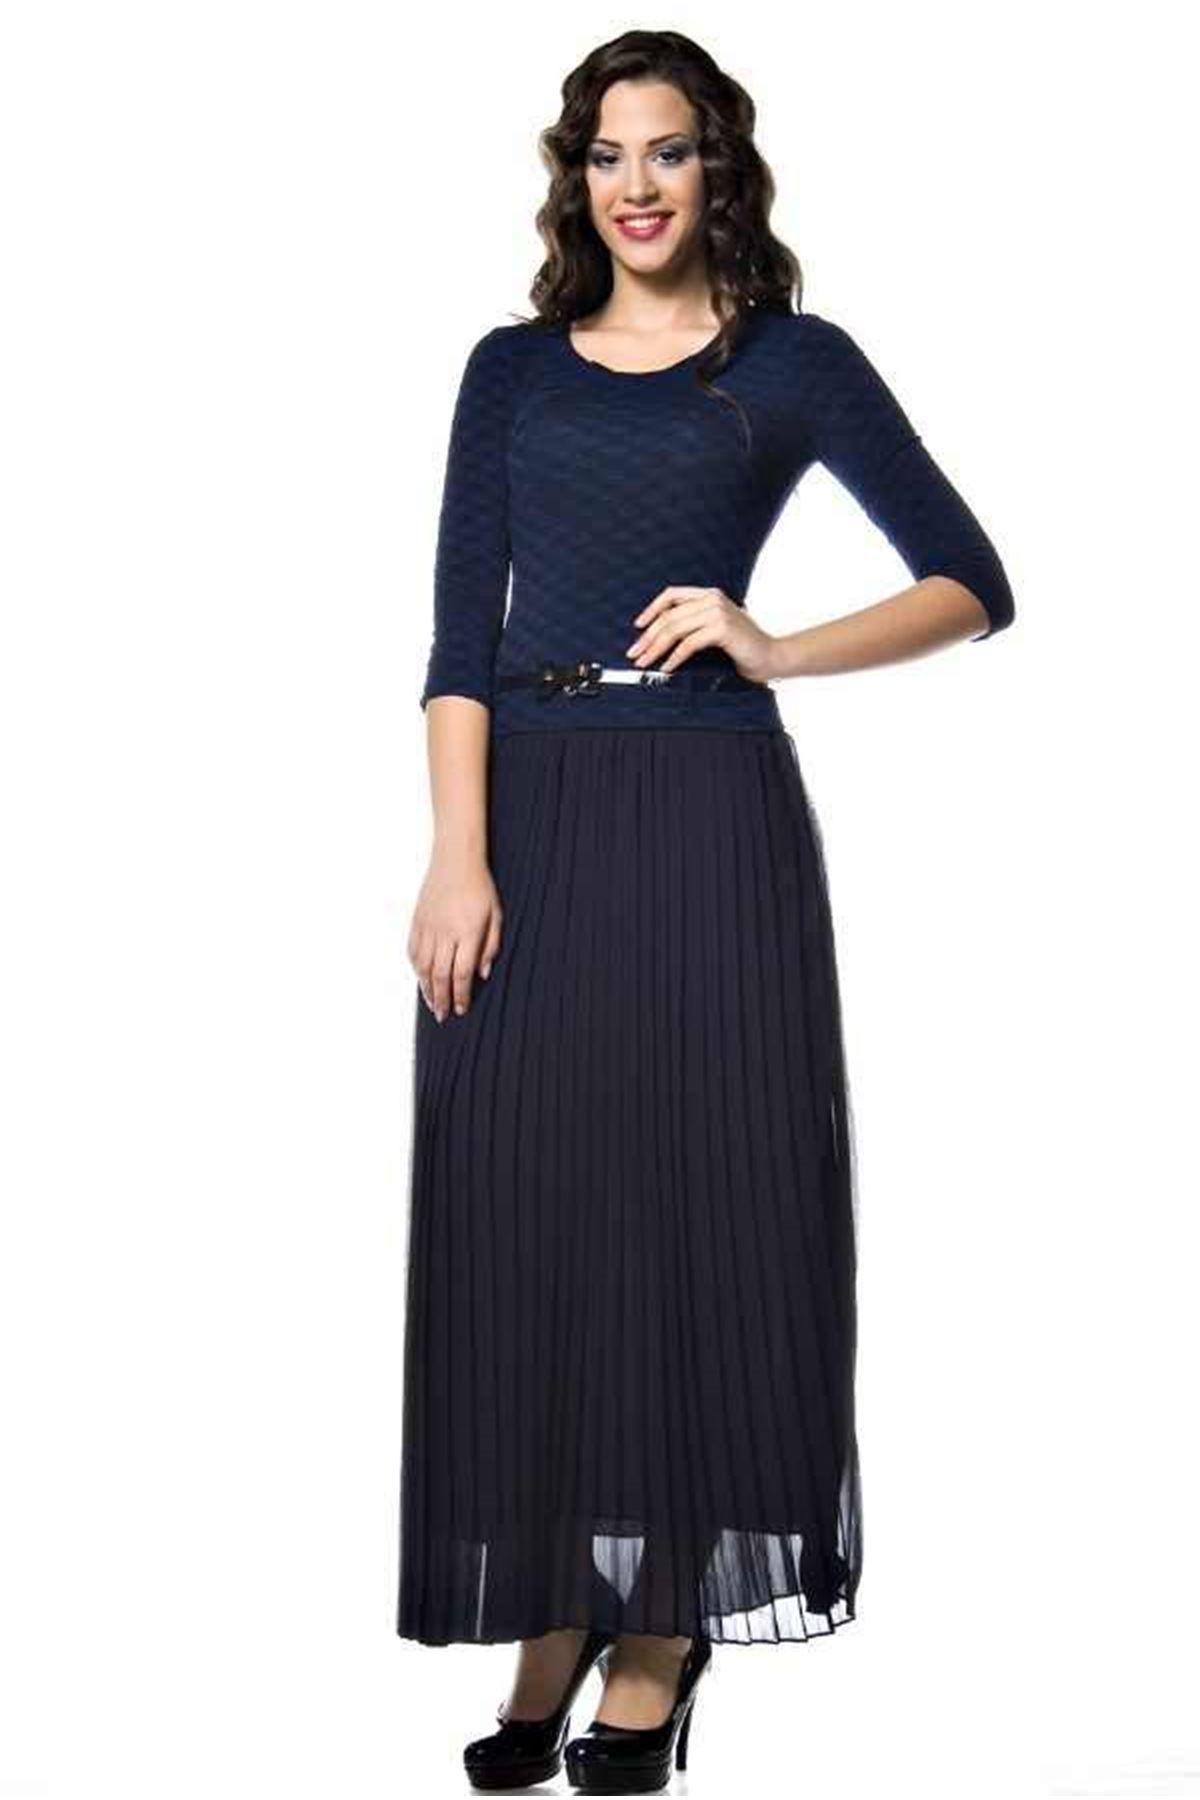 Lacivert Pileli Elbise G9-49764